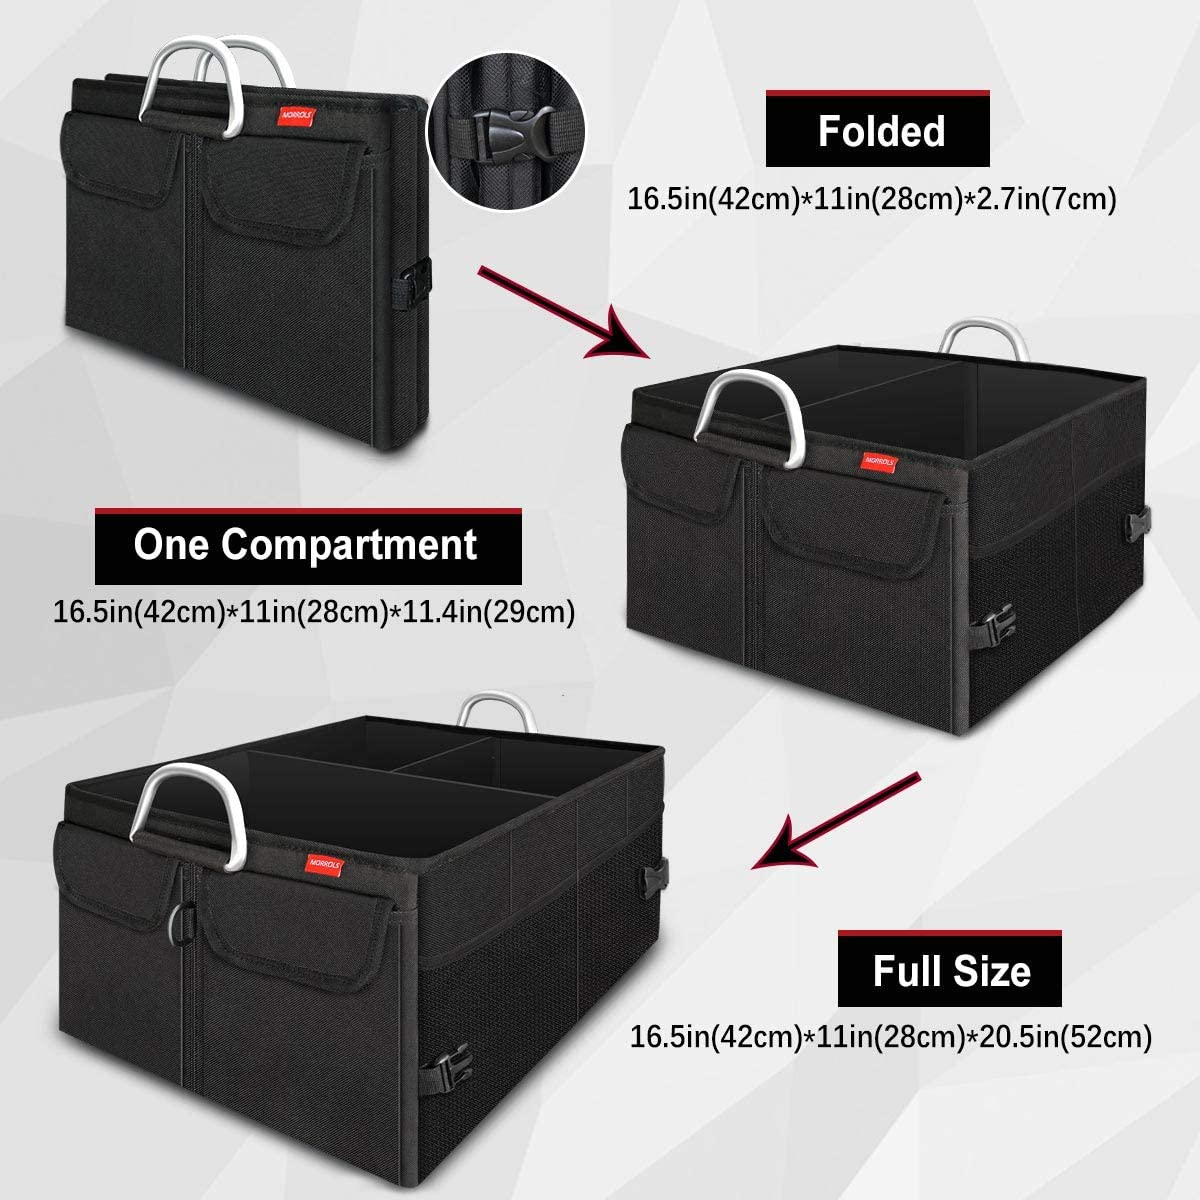 Negro Plegable Impermeable Bolsa Maletero Coche Organizador Coche MORROLS Organizador Maletero de Coche Varios Compartimentos